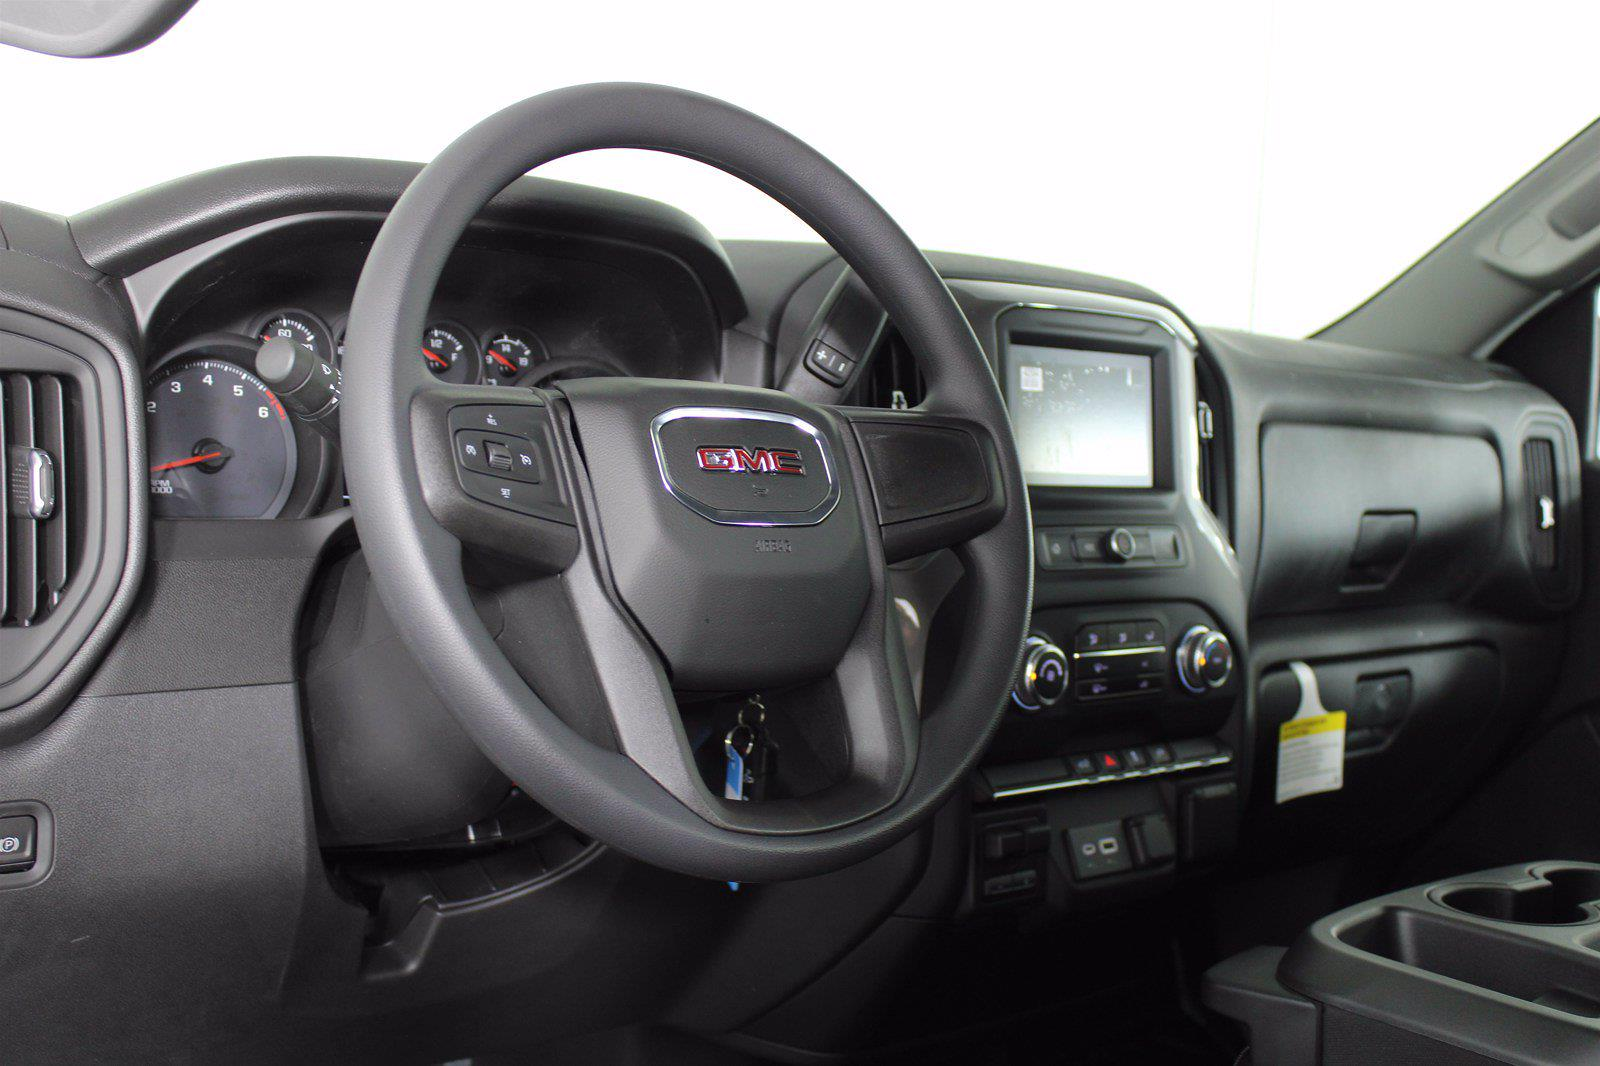 2021 GMC Sierra 1500 Regular Cab 4x4, Pickup #D411083 - photo 9